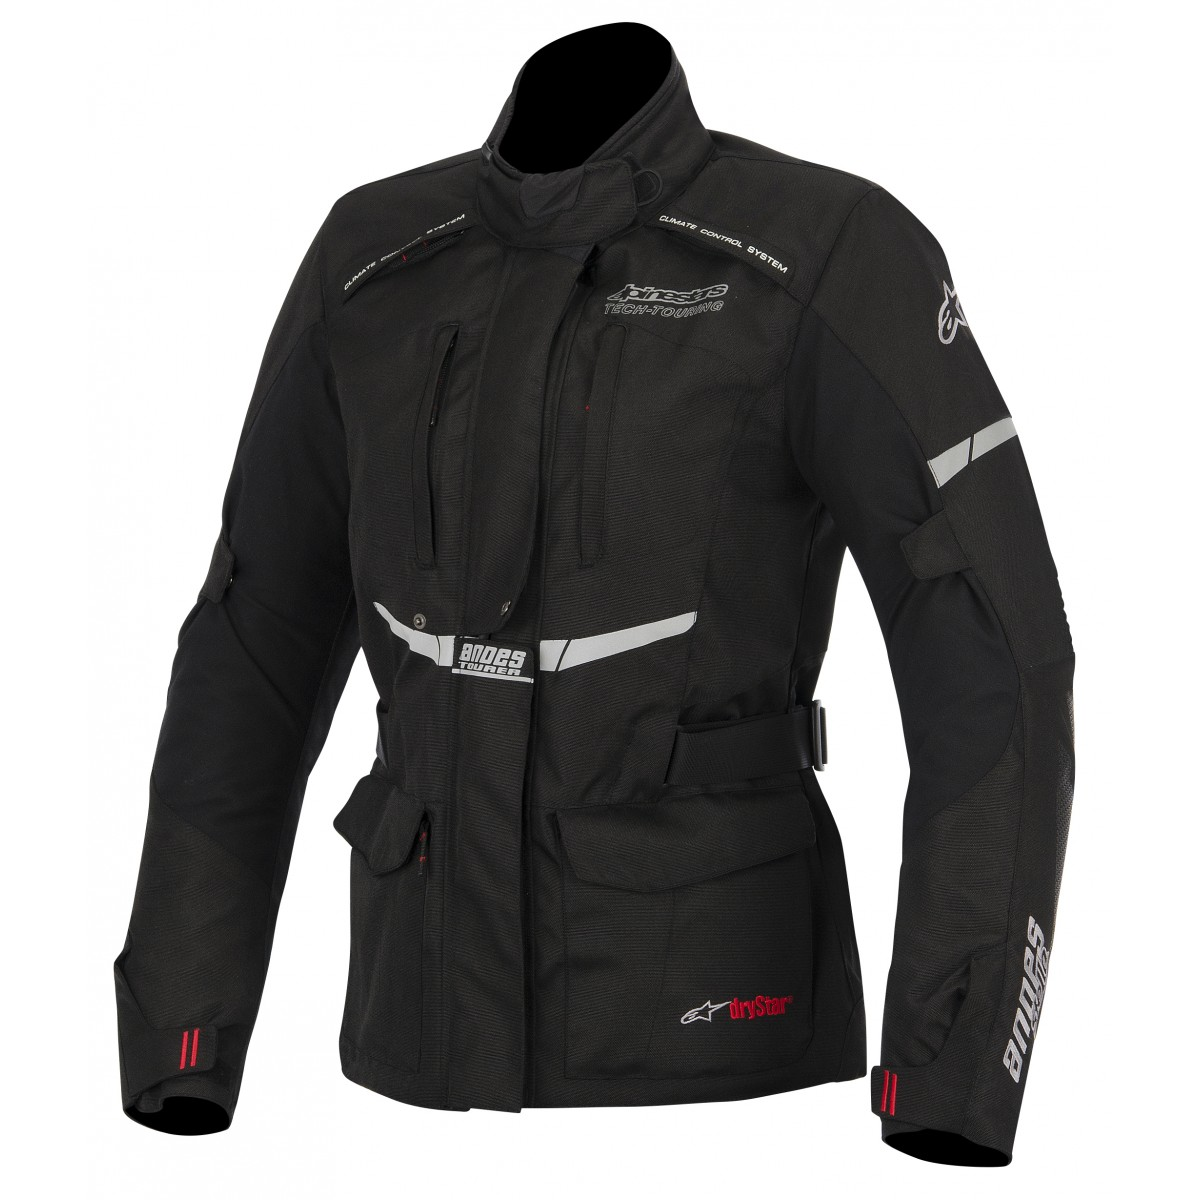 Jaqueta Alpinestars Stella Andes Drystar® WP Preta/ Feminina  (COMPRE JUNTO!) para Big Trail  - Super Bike - Loja Oficial Alpinestars